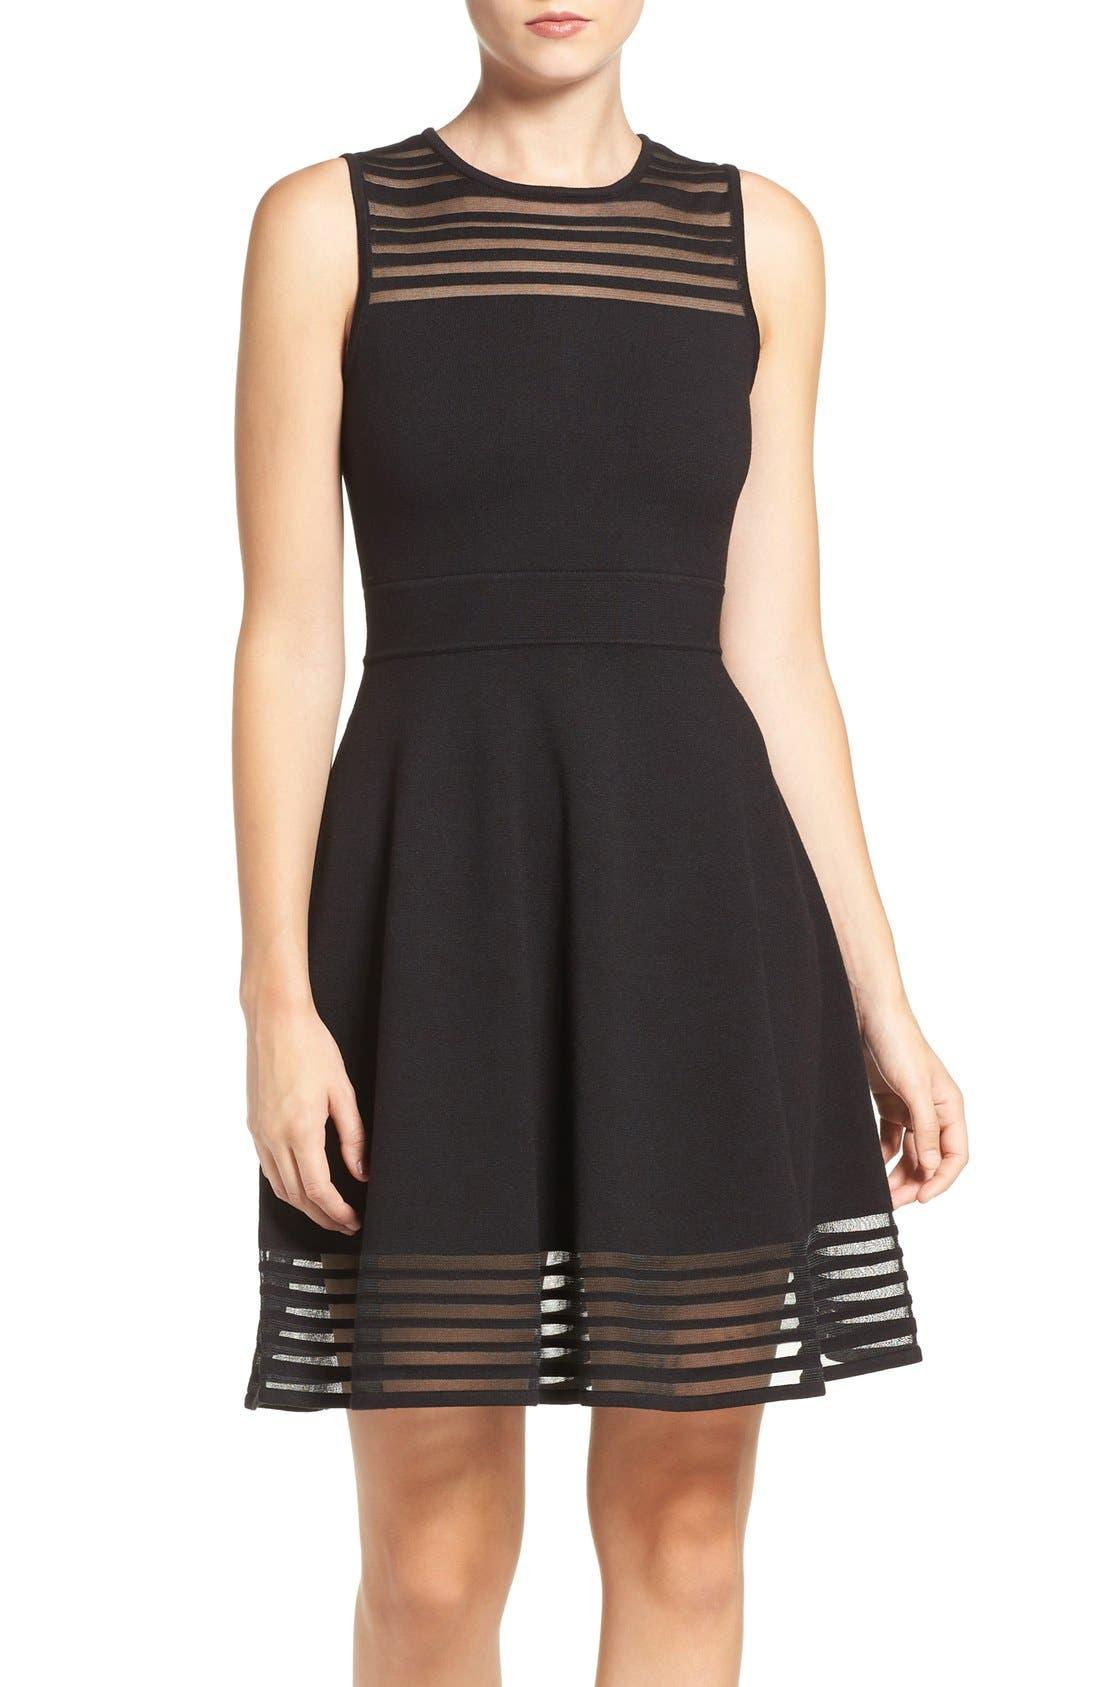 Alternate Image 1 Selected - Eliza J Stripe Fit & Flare Dress (Regular & Petite)